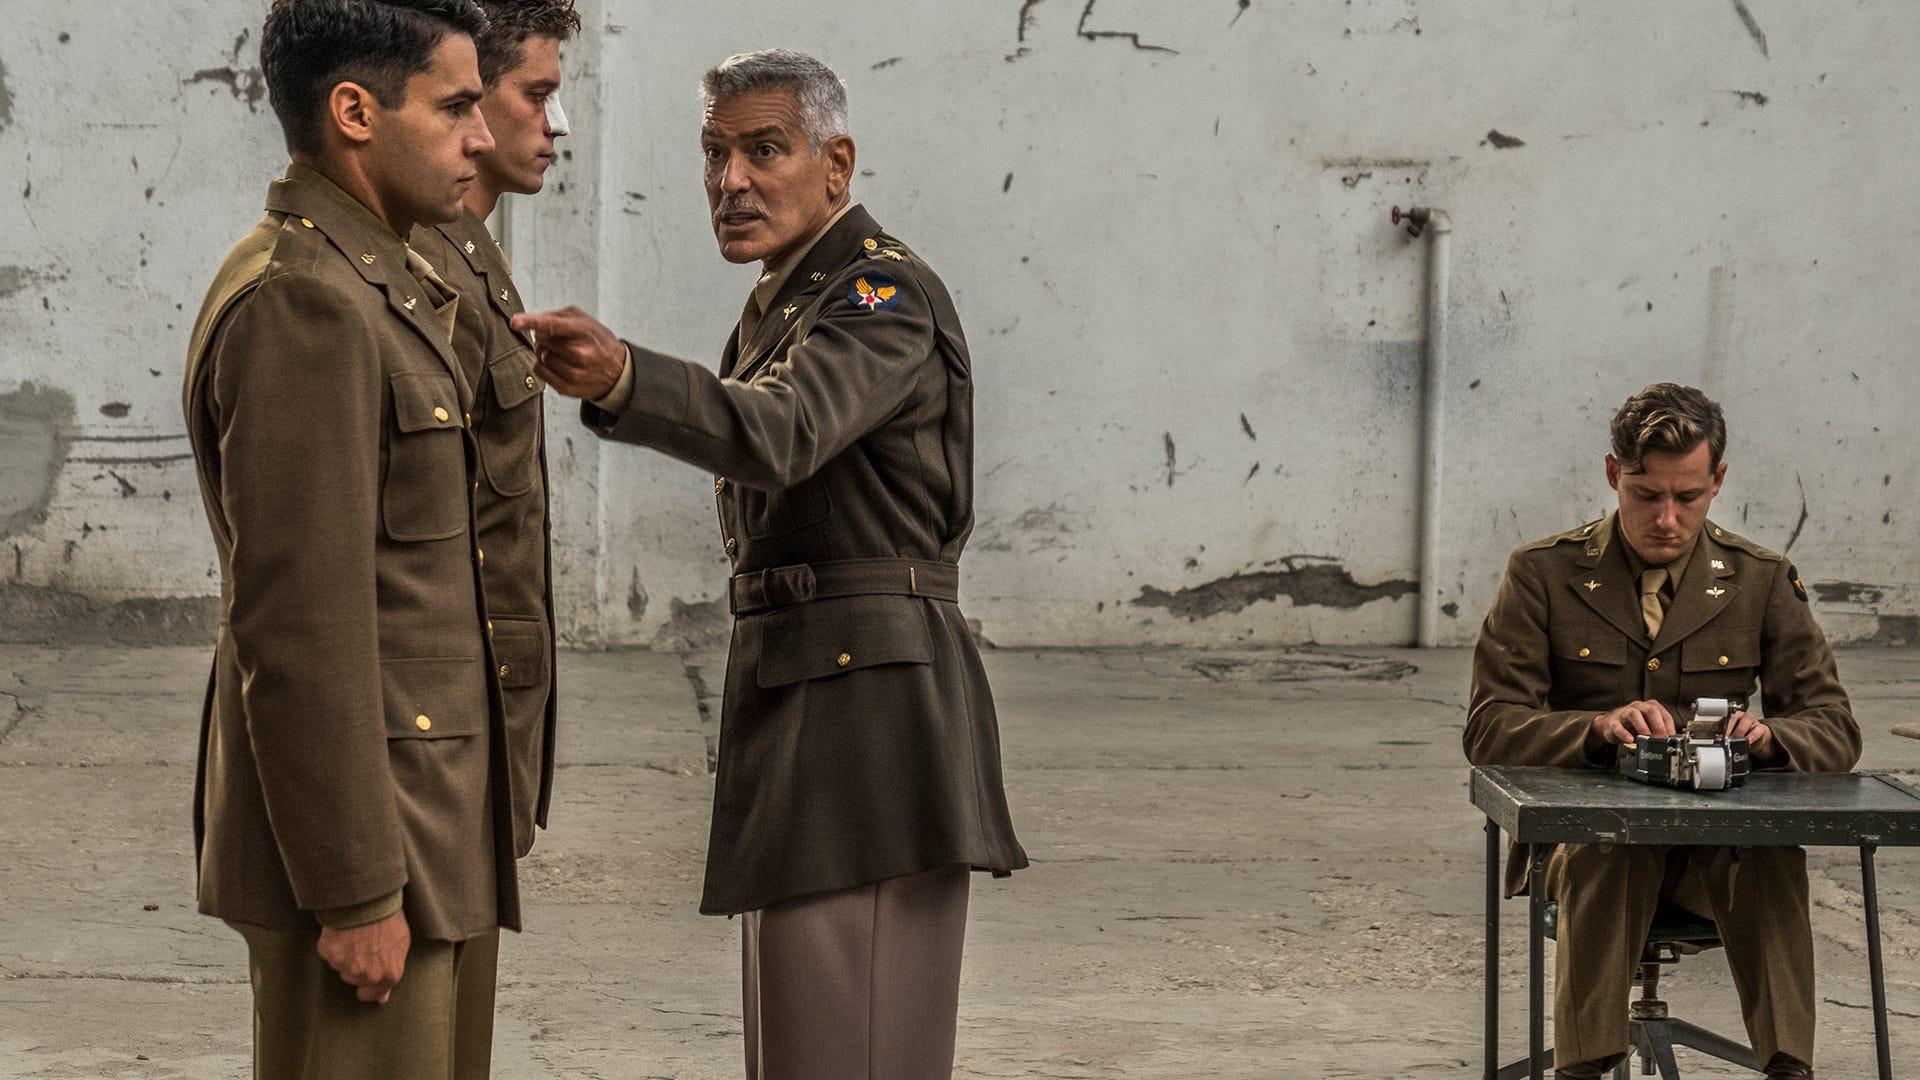 Christopher Abbott, Pico Alexander, George Clooney, Lewis Pullman, Catch 22